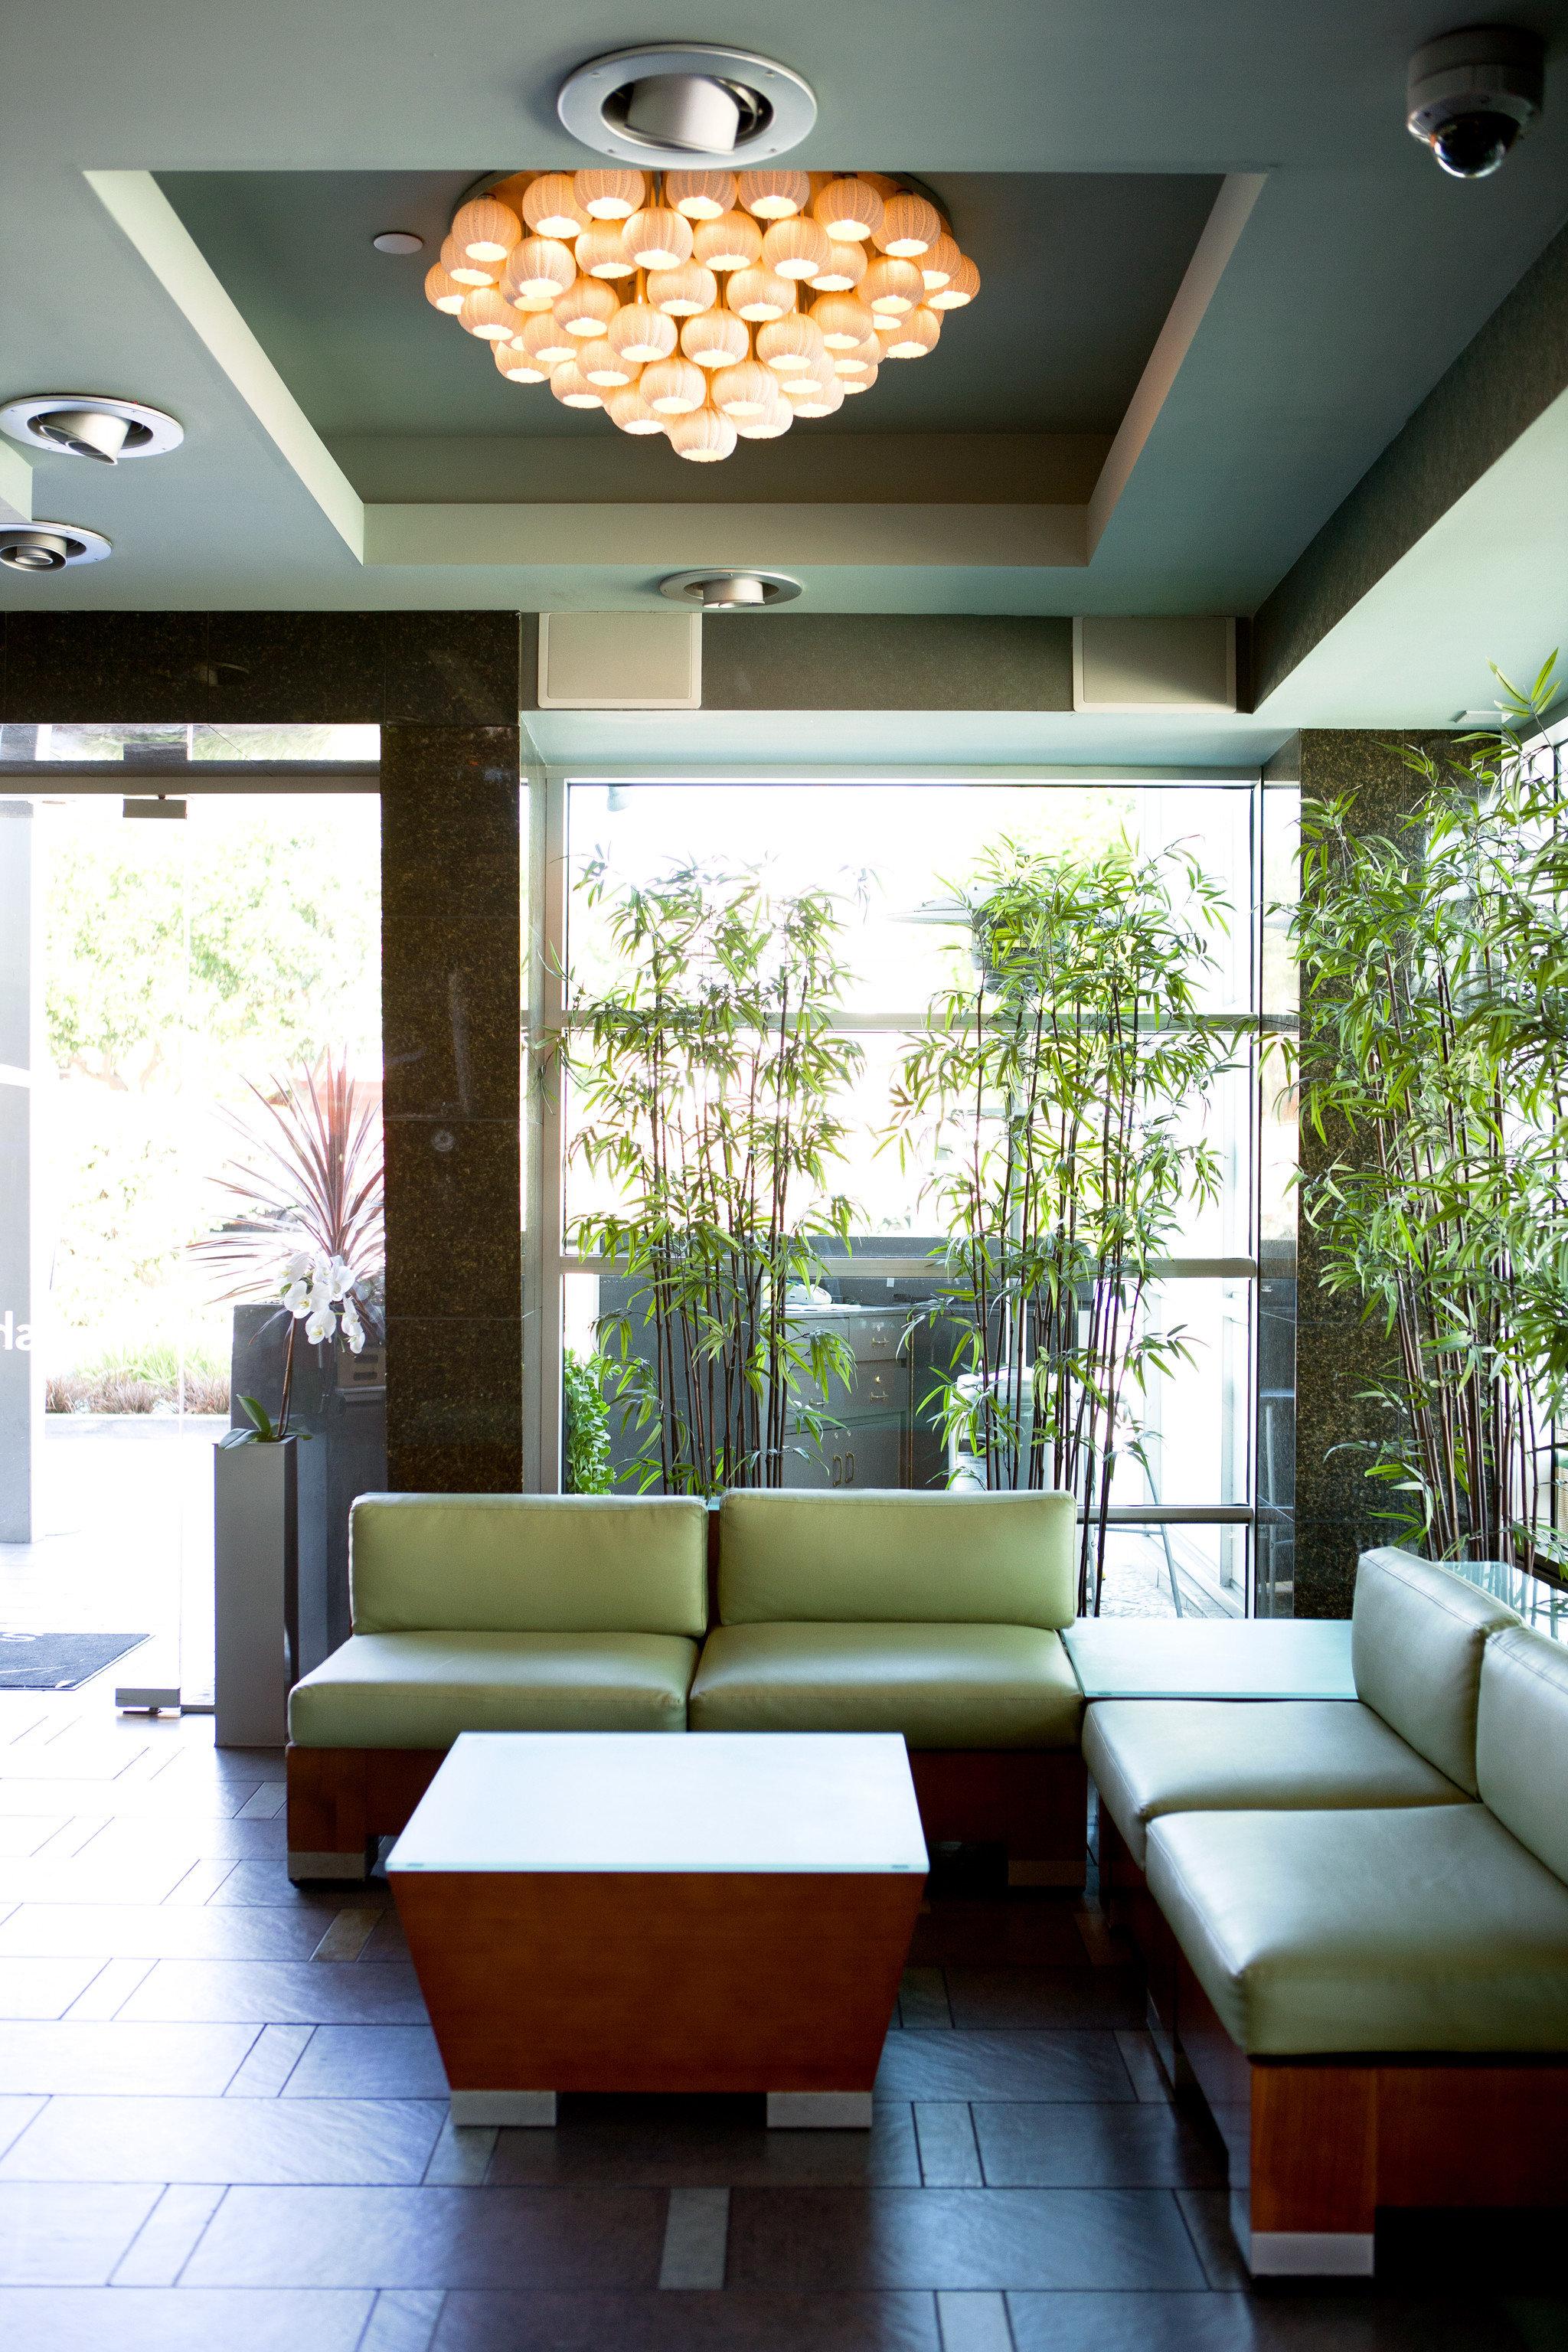 Beach Lounge Luxury Modern sofa property living room Lobby home condominium lighting daylighting porch